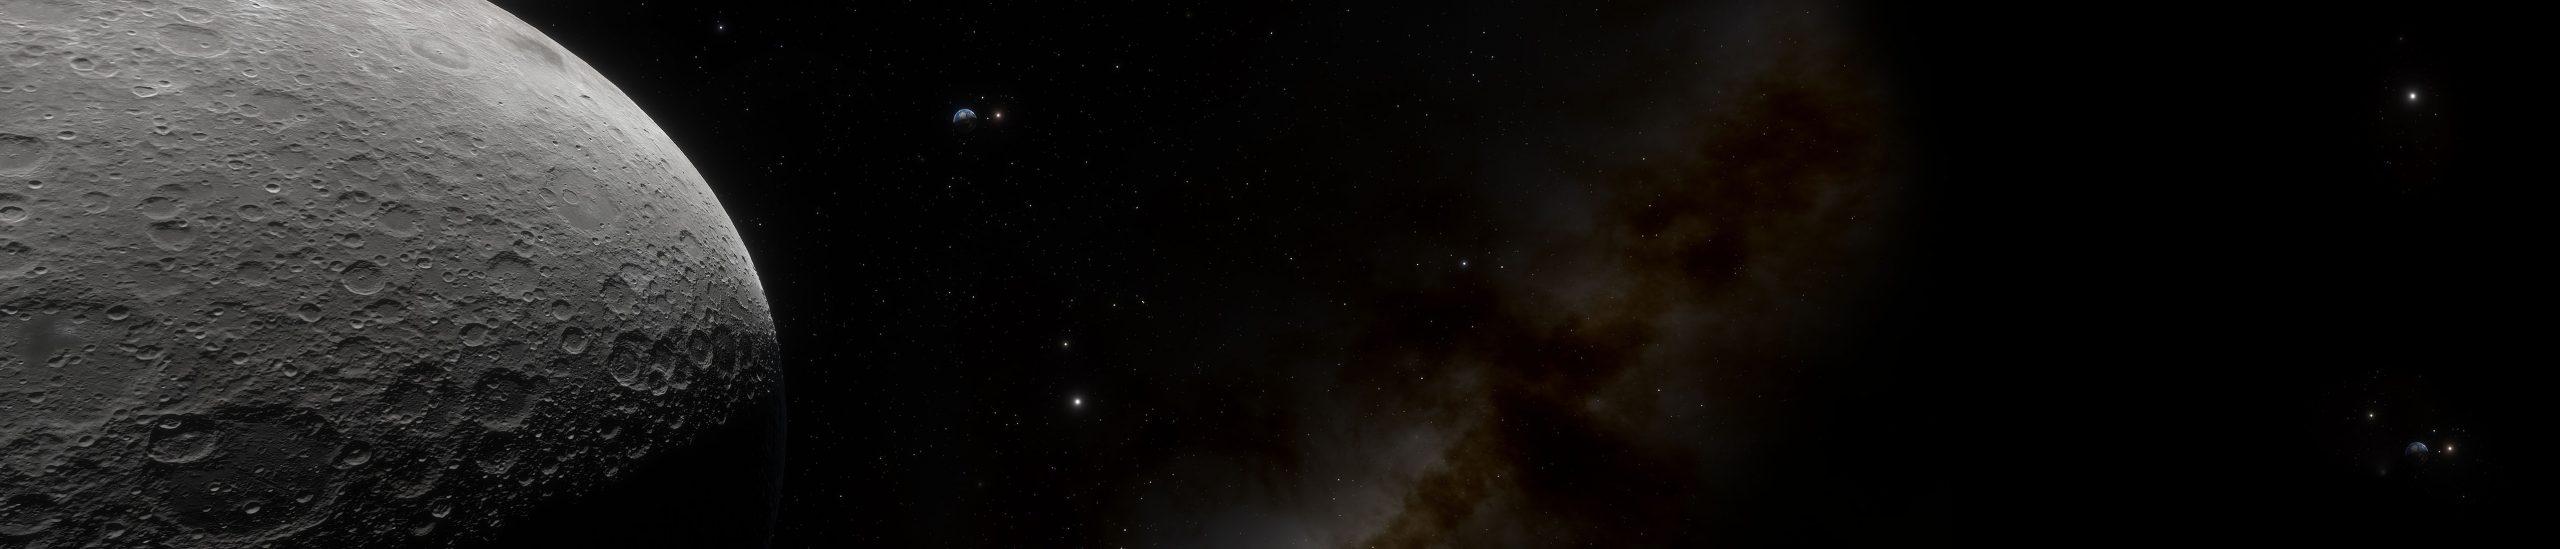 solar-system-5401235